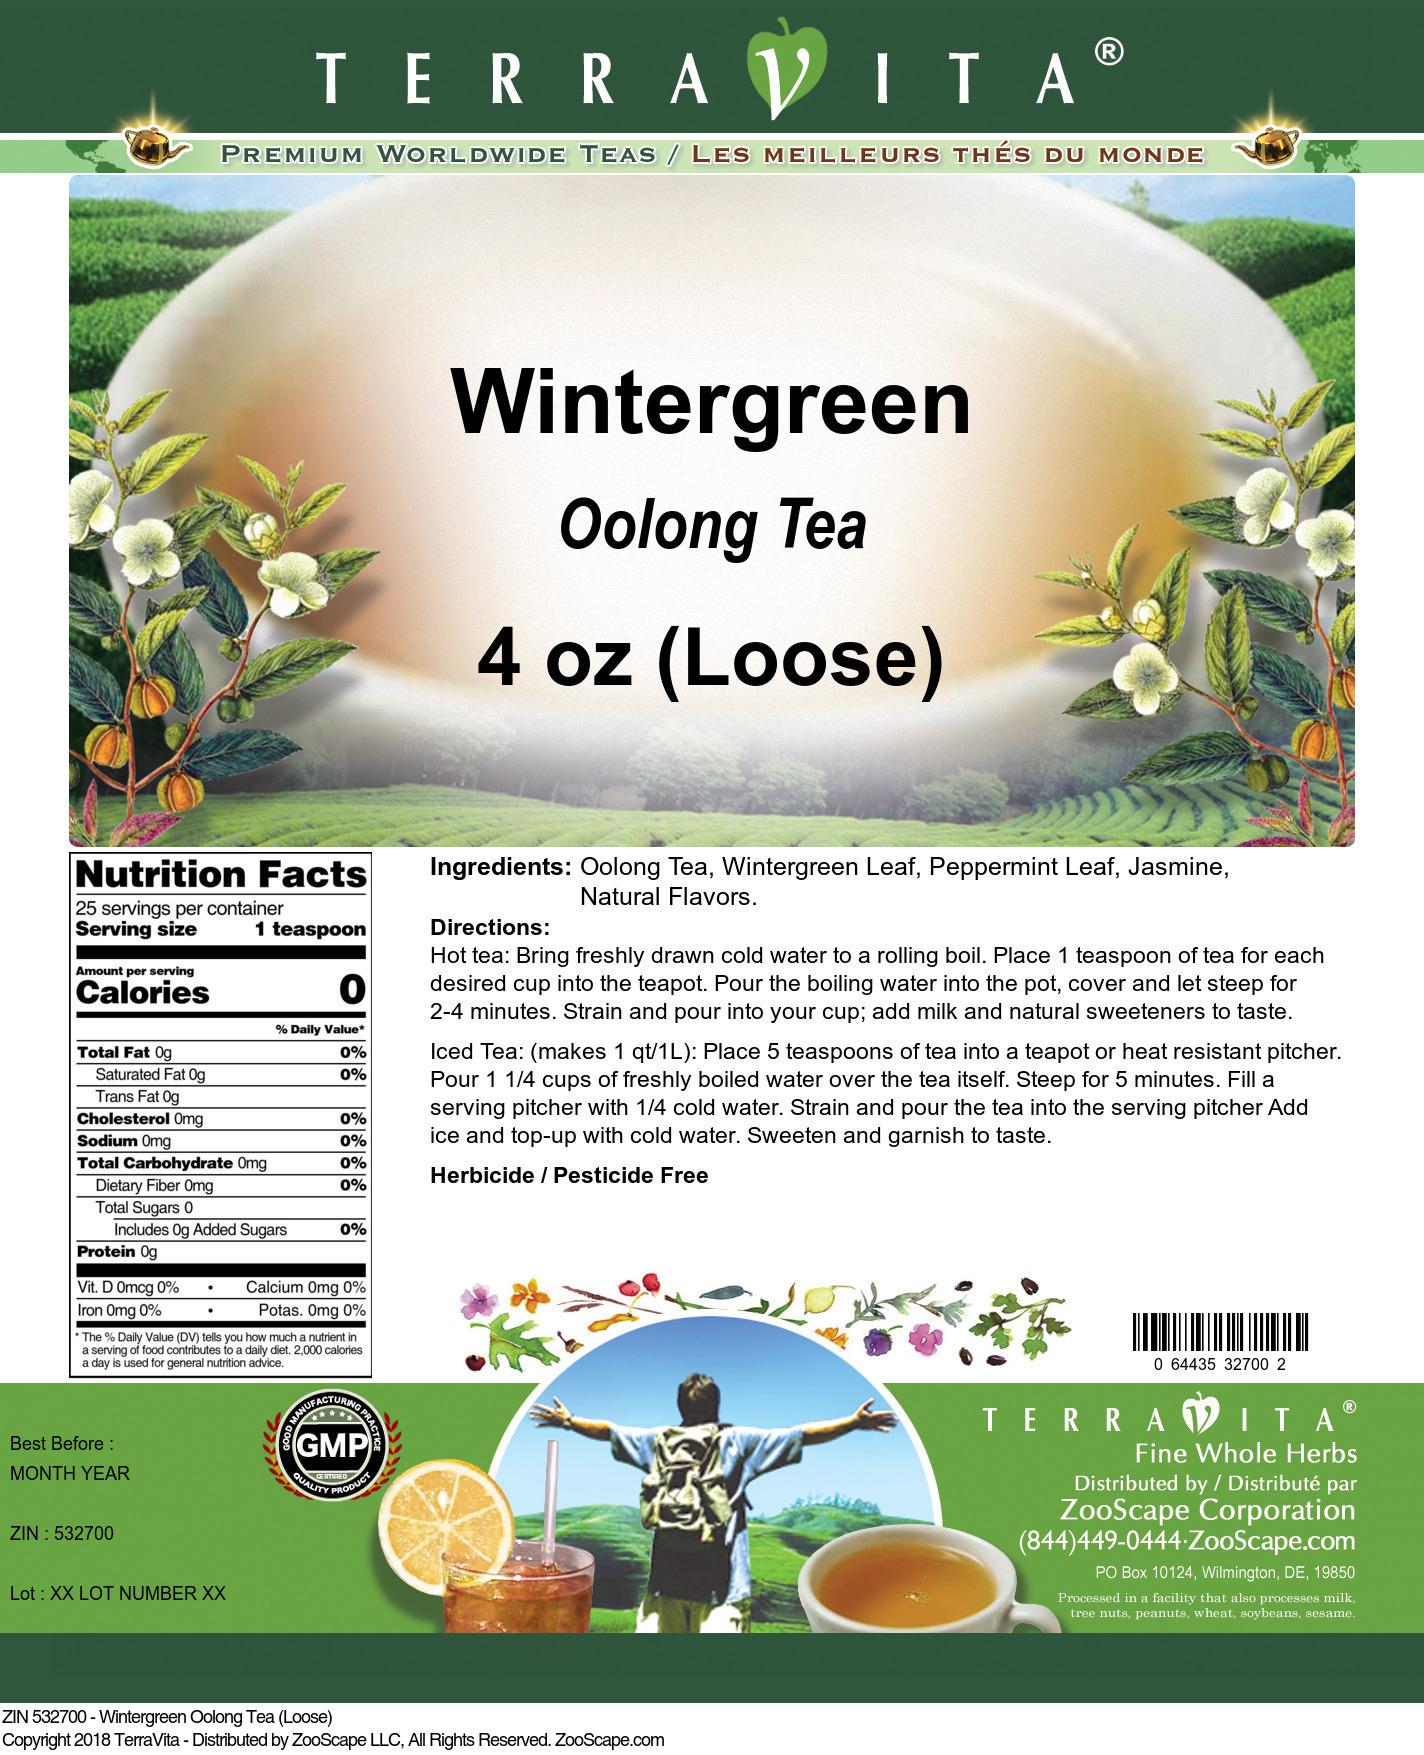 Wintergreen Oolong Tea (Loose)